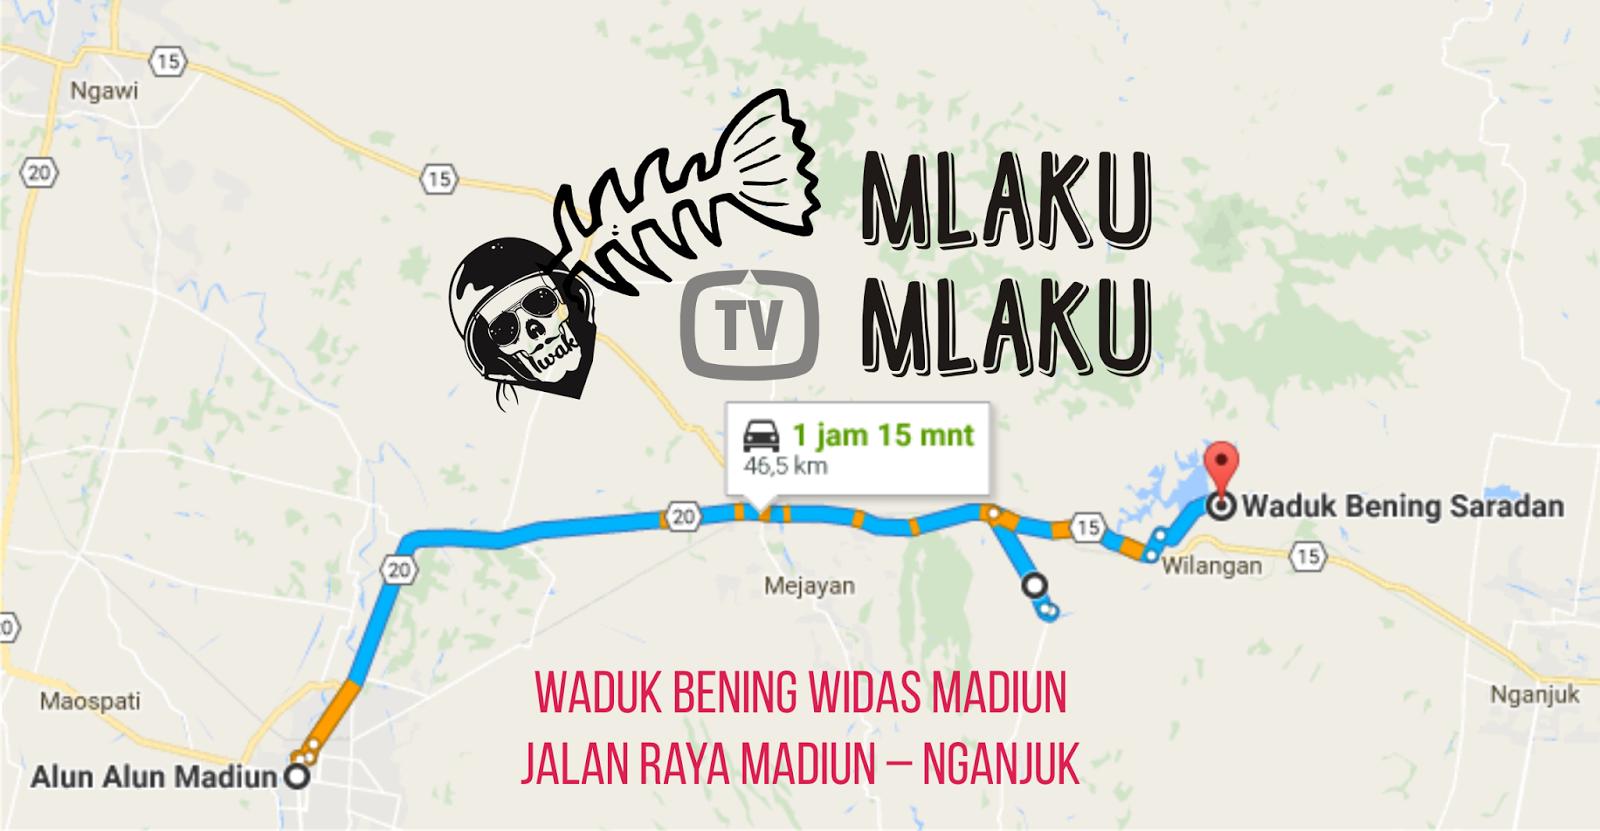 IWAK tv